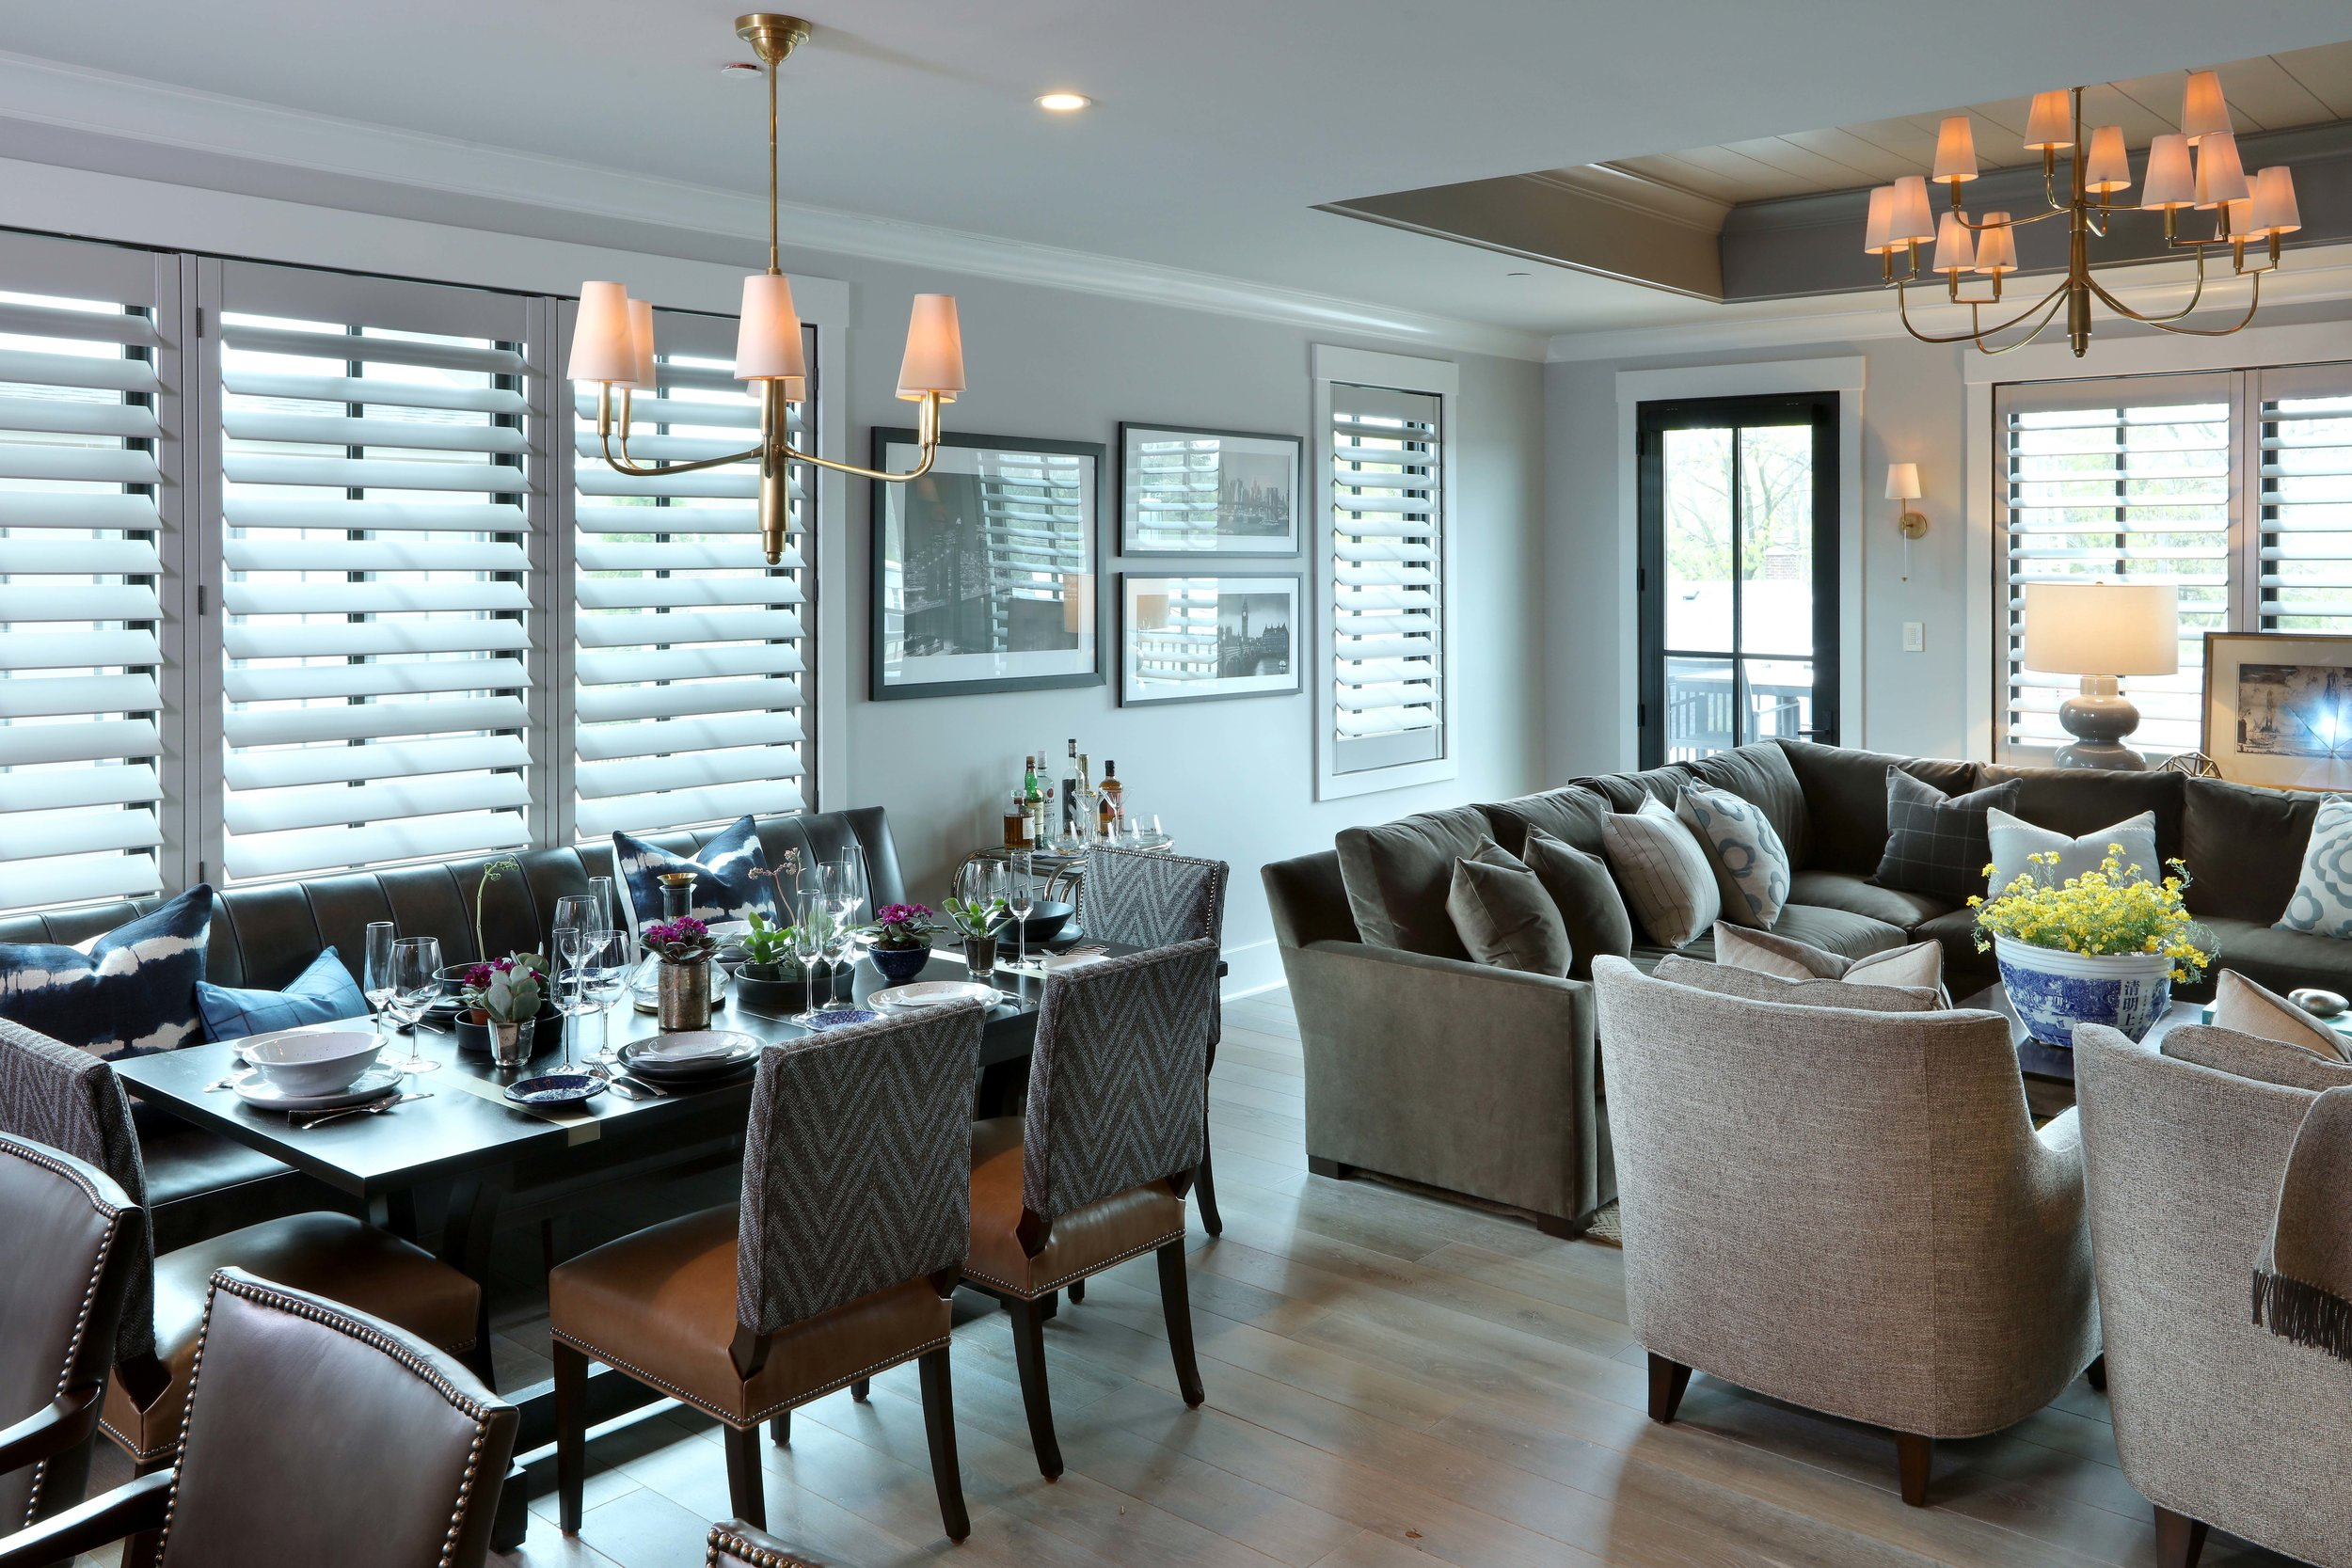 Vision-Interiors-Visbeen-Showroom-Grand-Rapids-Residence-Dining-Living.jpg